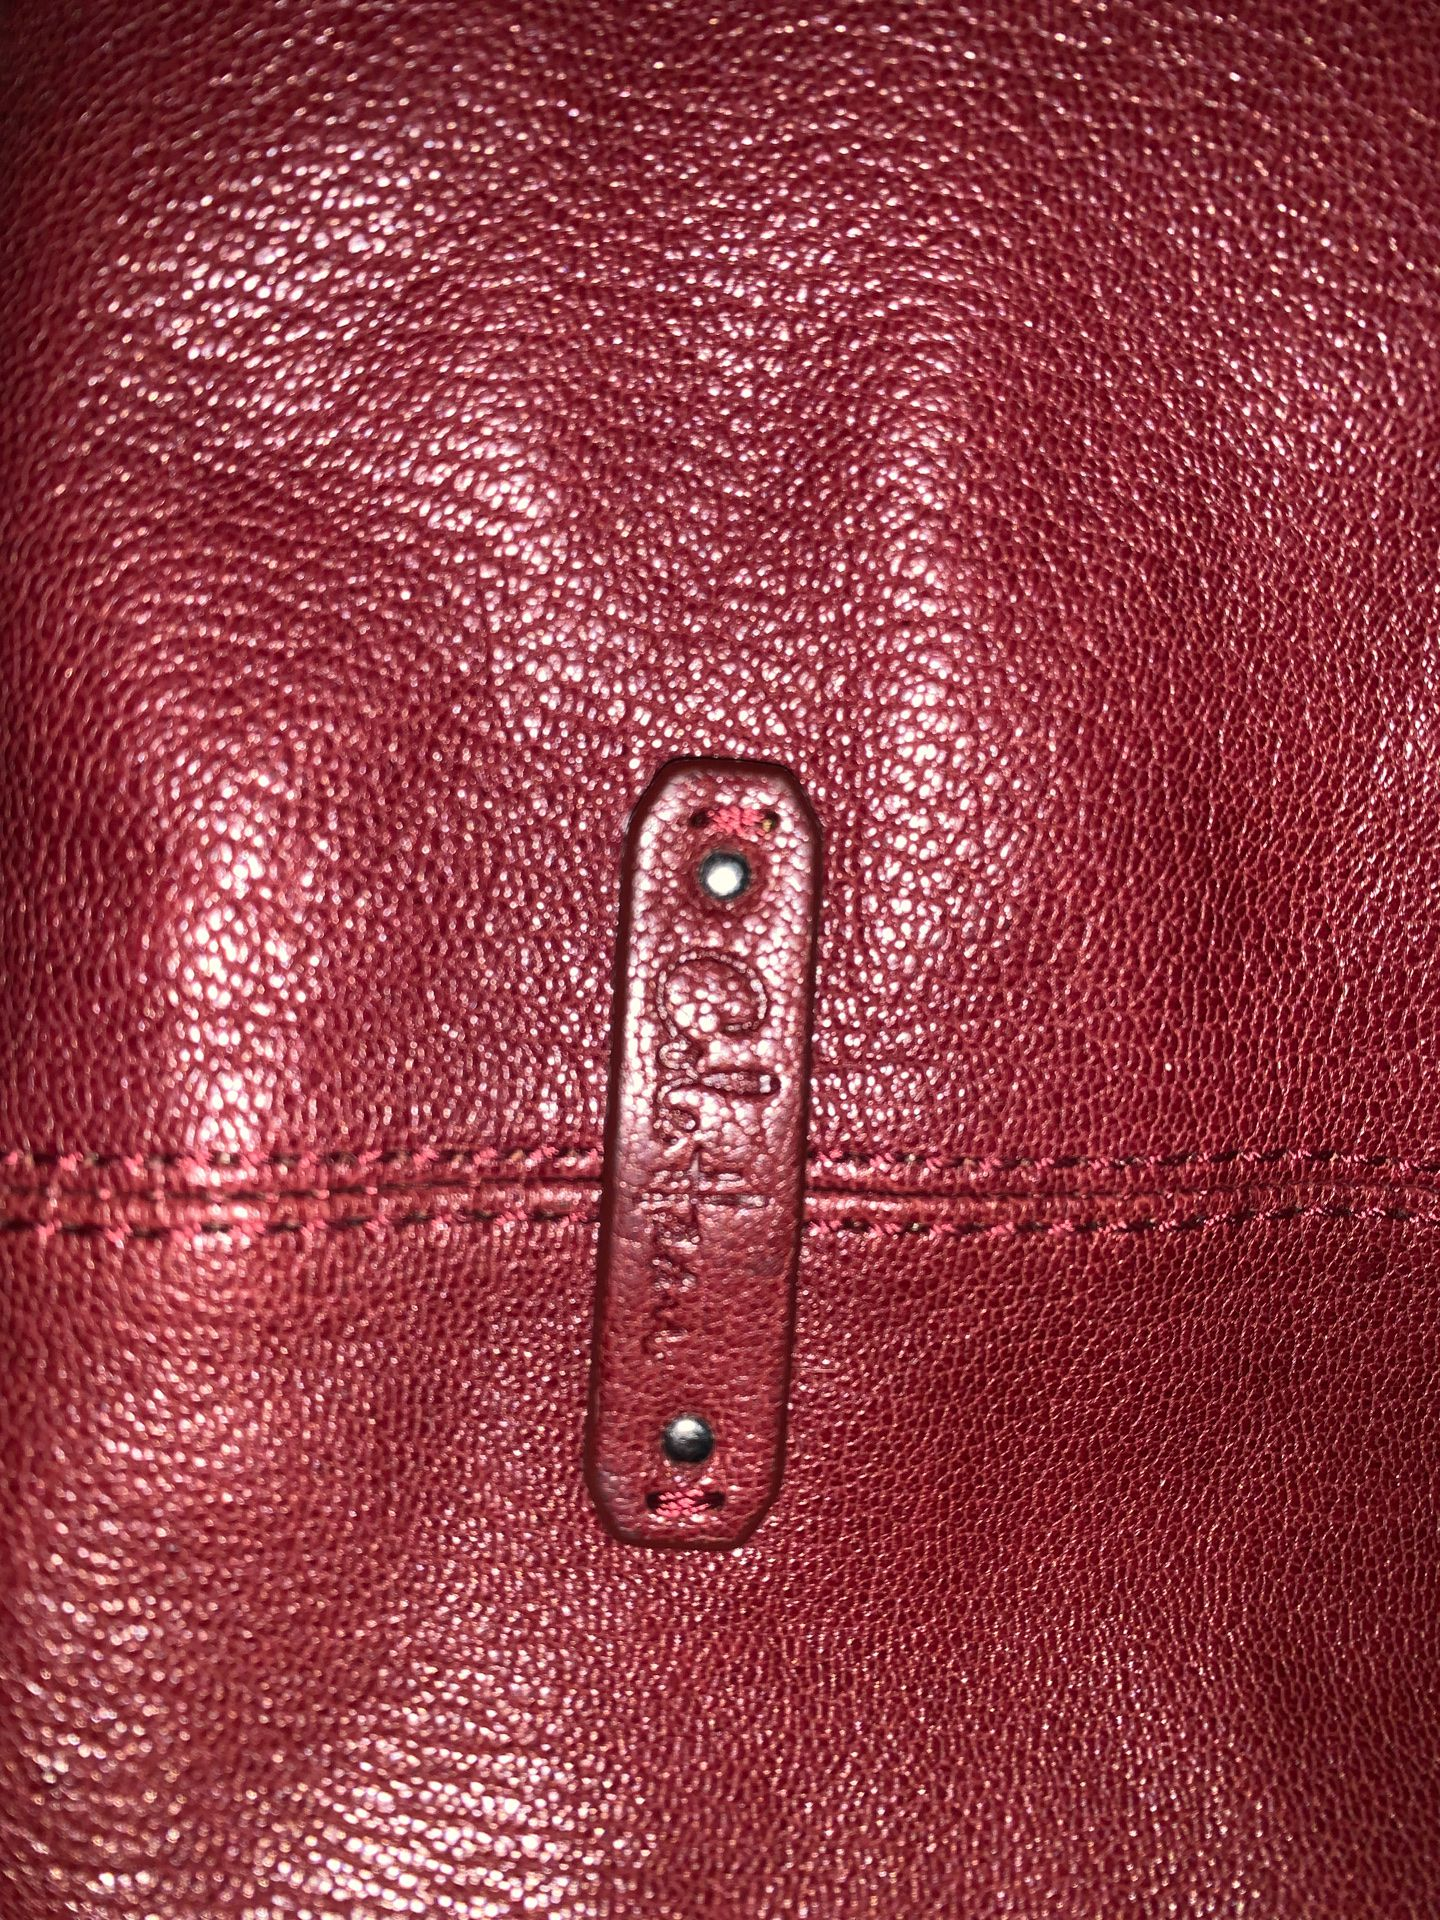 Cole Haan purse/bag